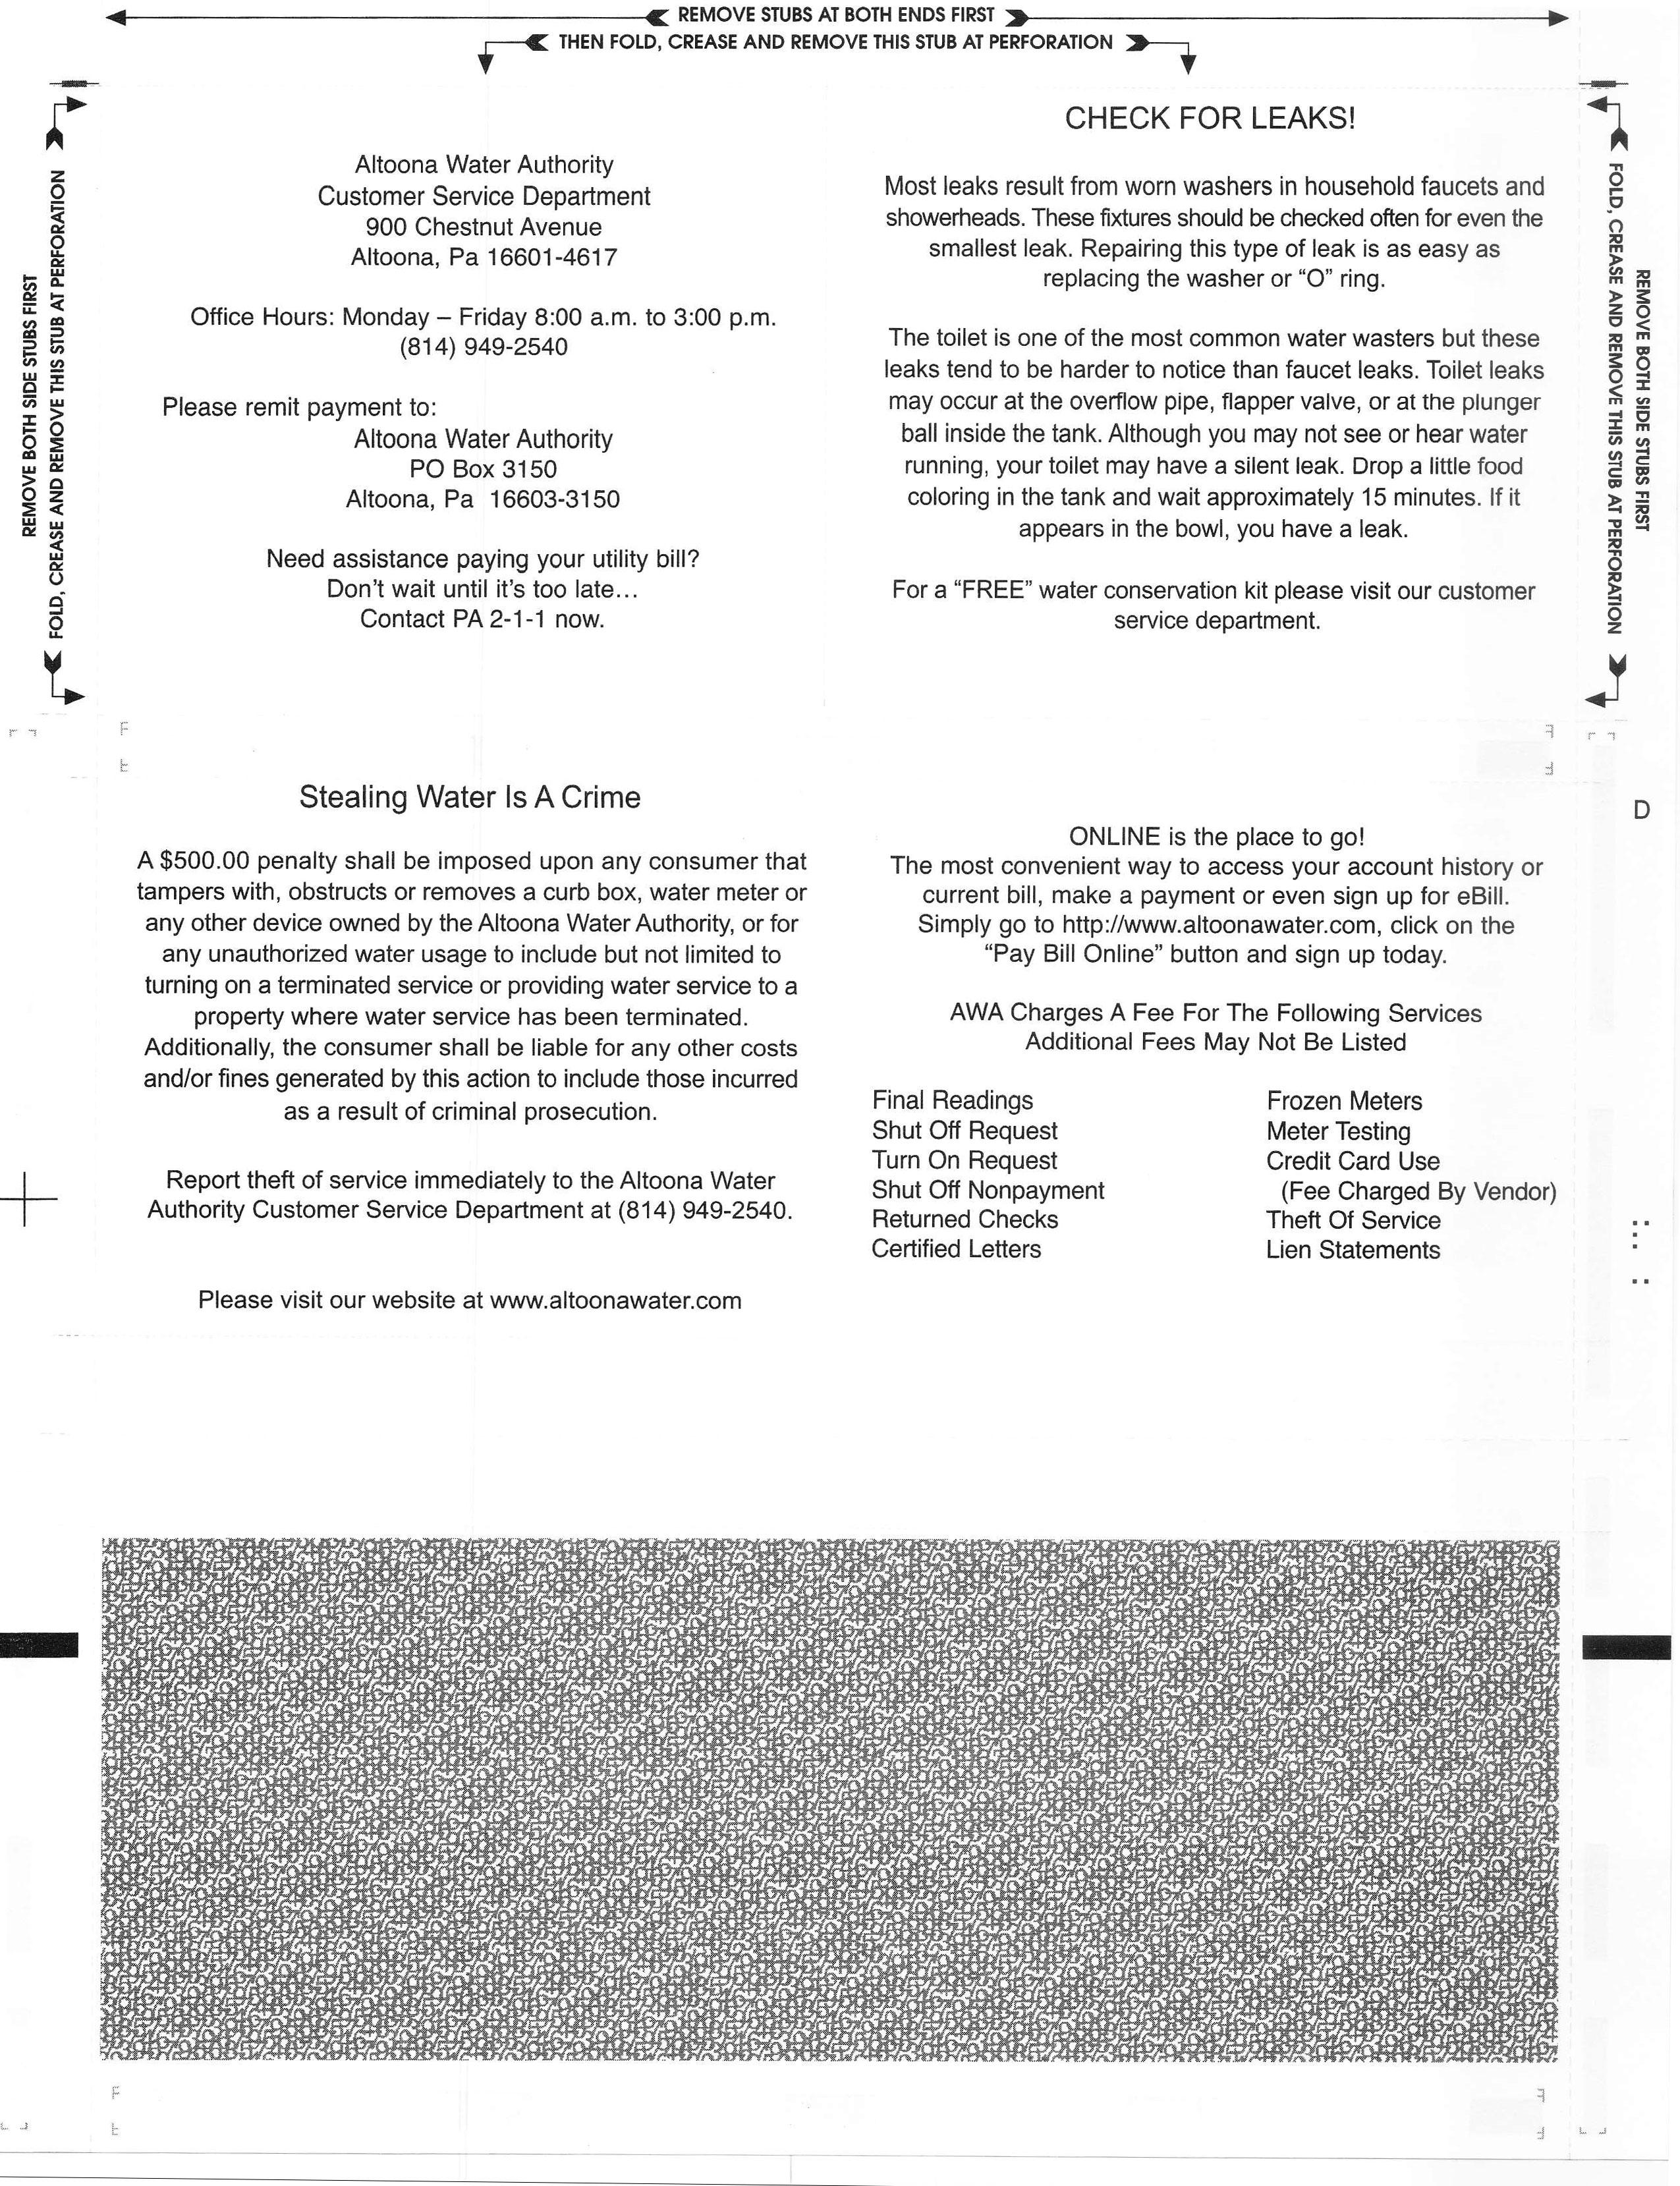 sample of bill (back)